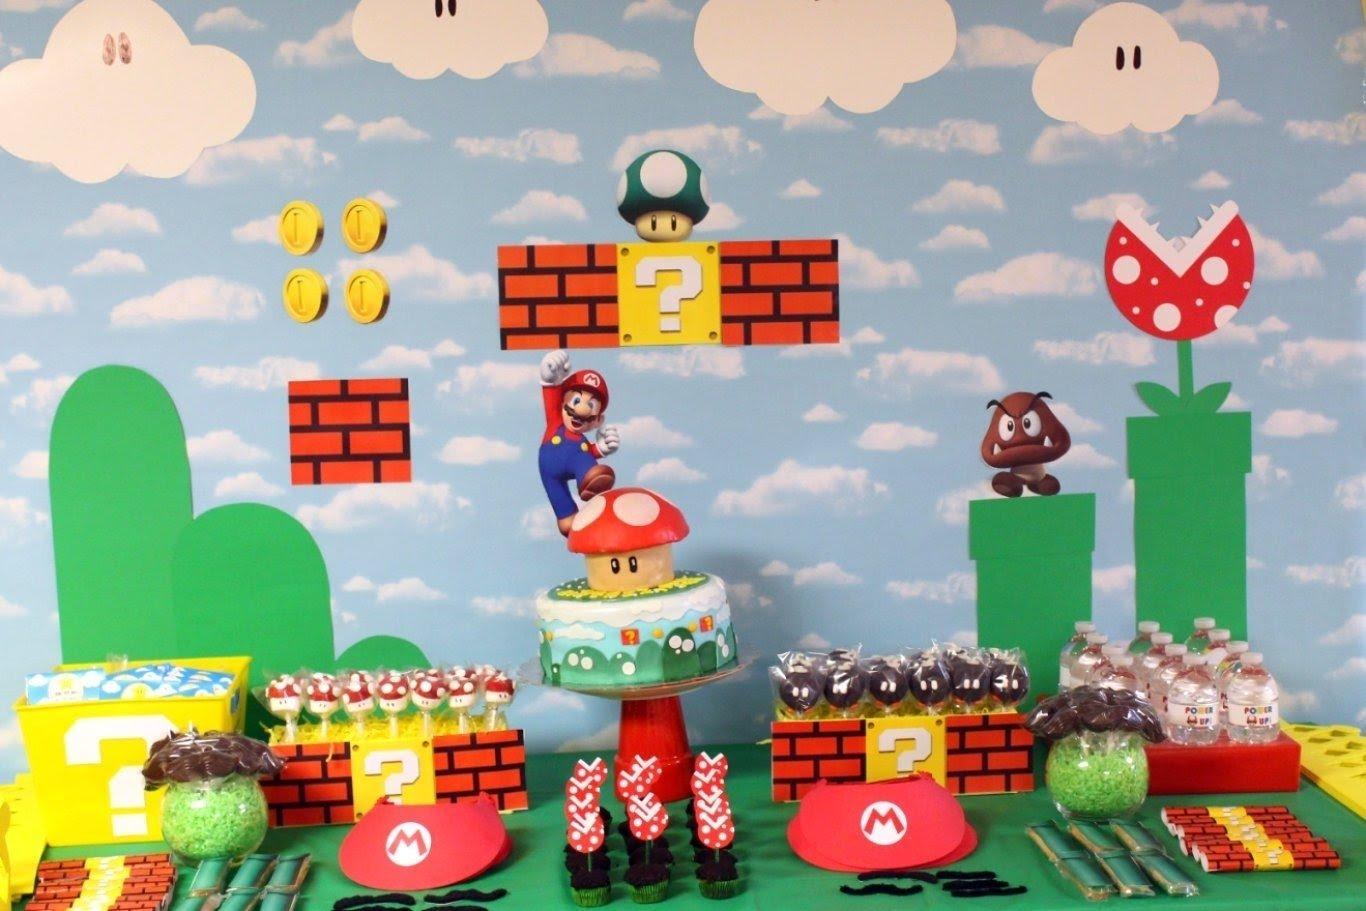 10 Stylish Super Mario Bros Birthday Party Ideas mario birthday party decorations and walk through abes world 3 2020